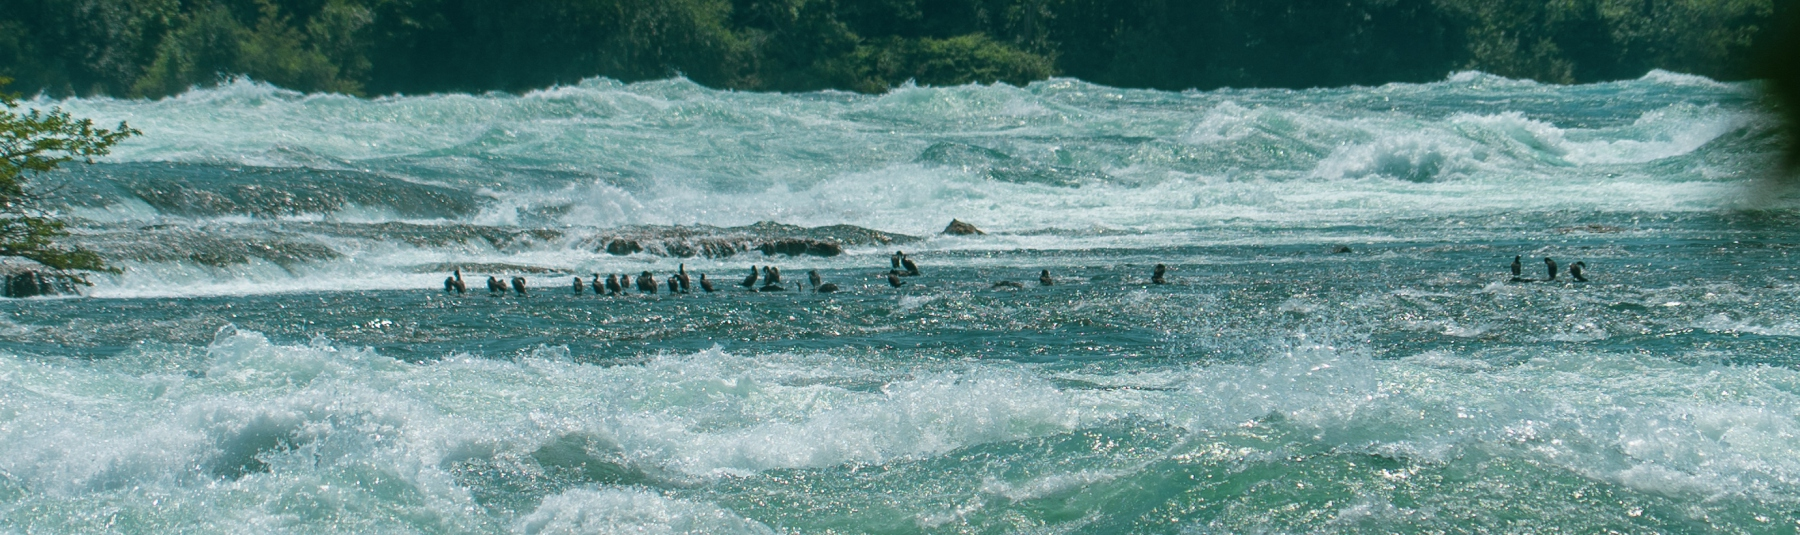 Ducks on the rapids